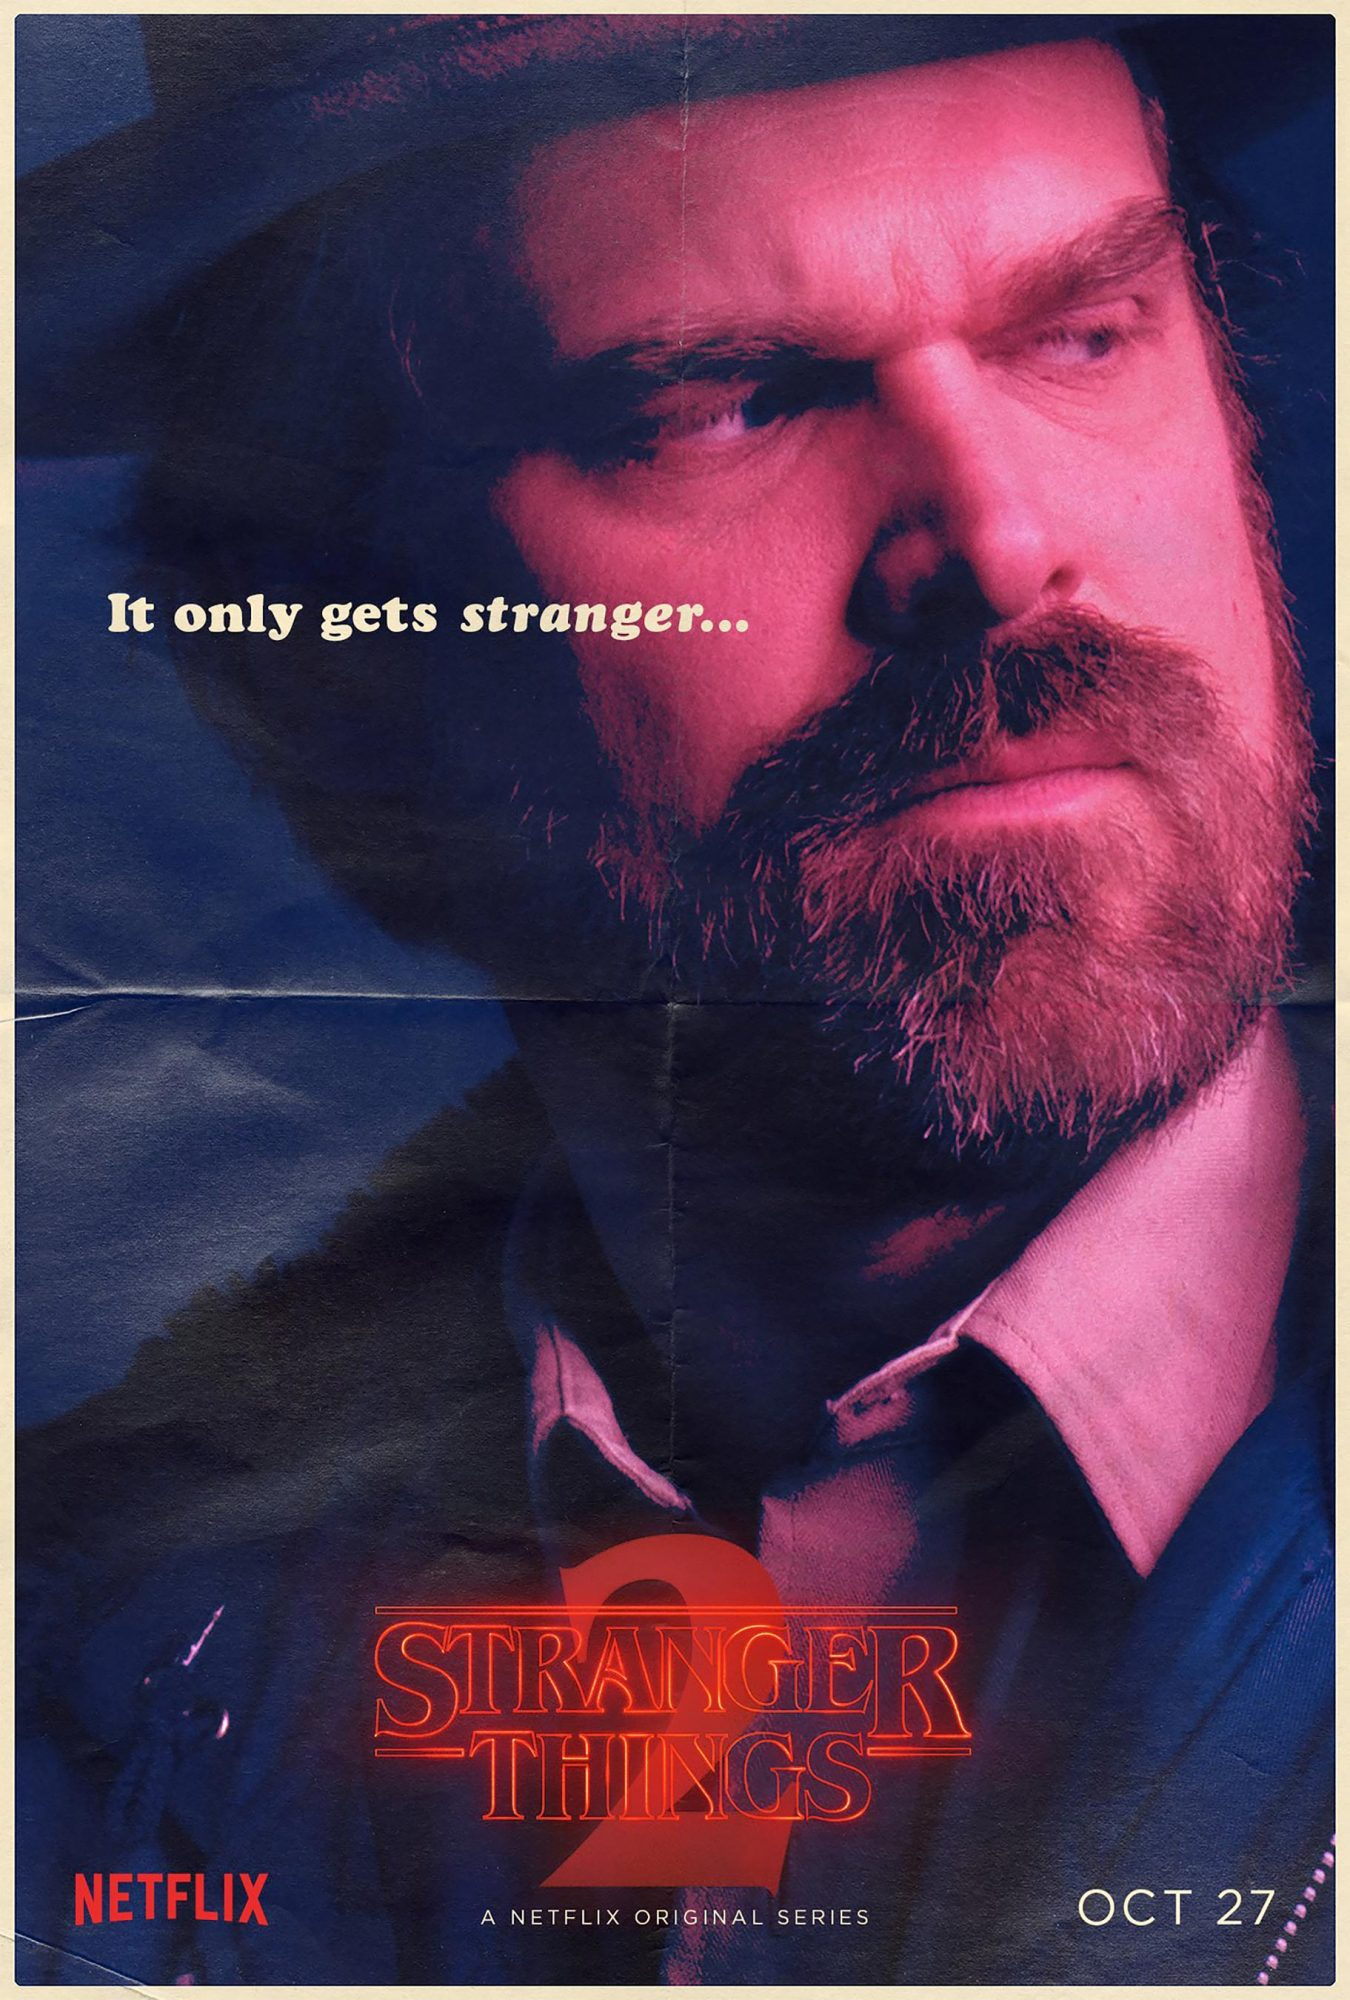 Stranger Things Season 2 - David Harbour CR: Netflix